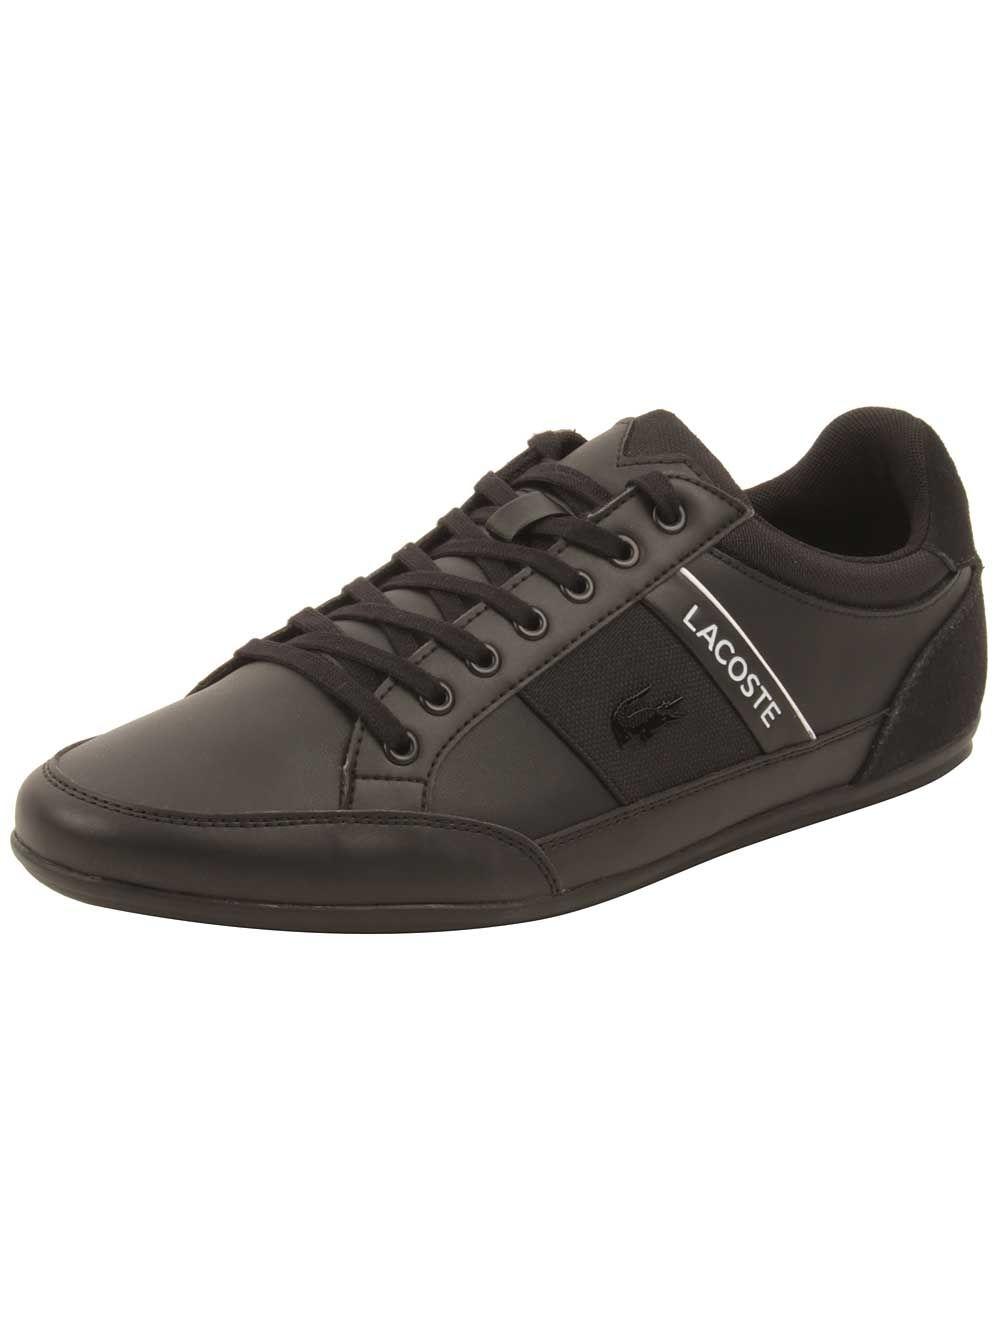 5a57f585d LACOSTE LACOSTE MEN S CHAYMON 318 5 US SNEAKER.  lacoste  shoes ...